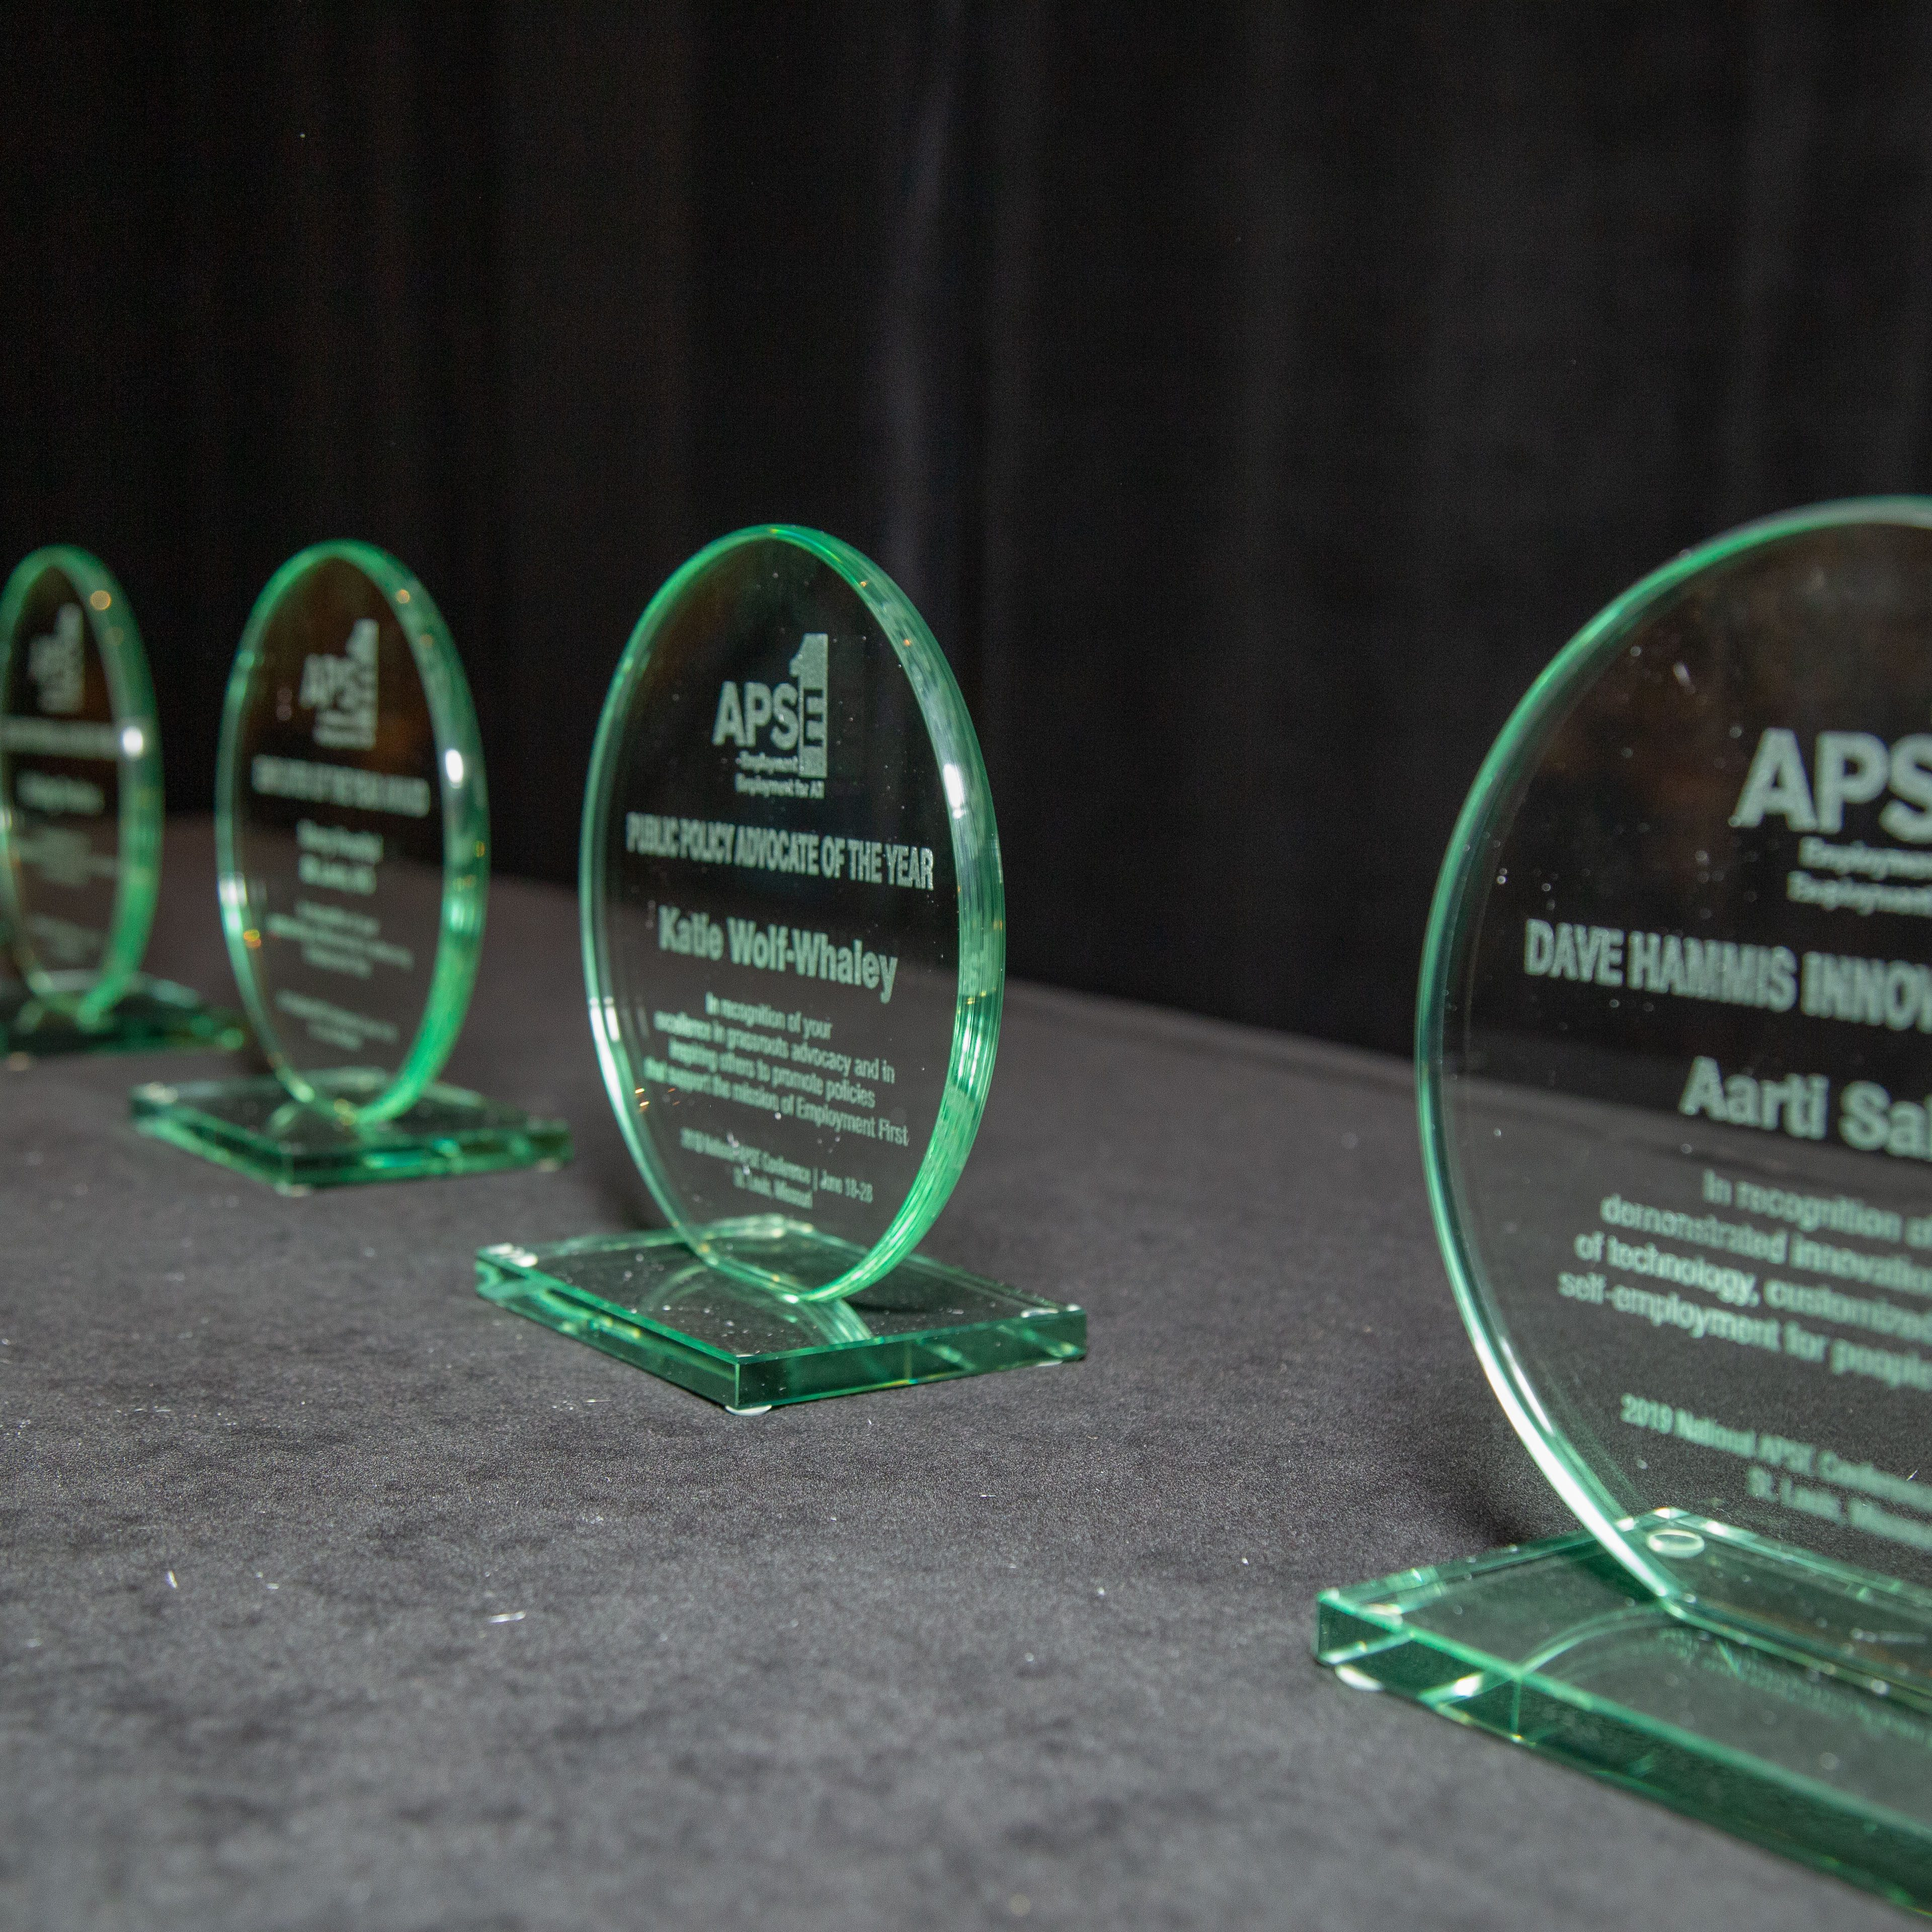 APSE 2019 Awards